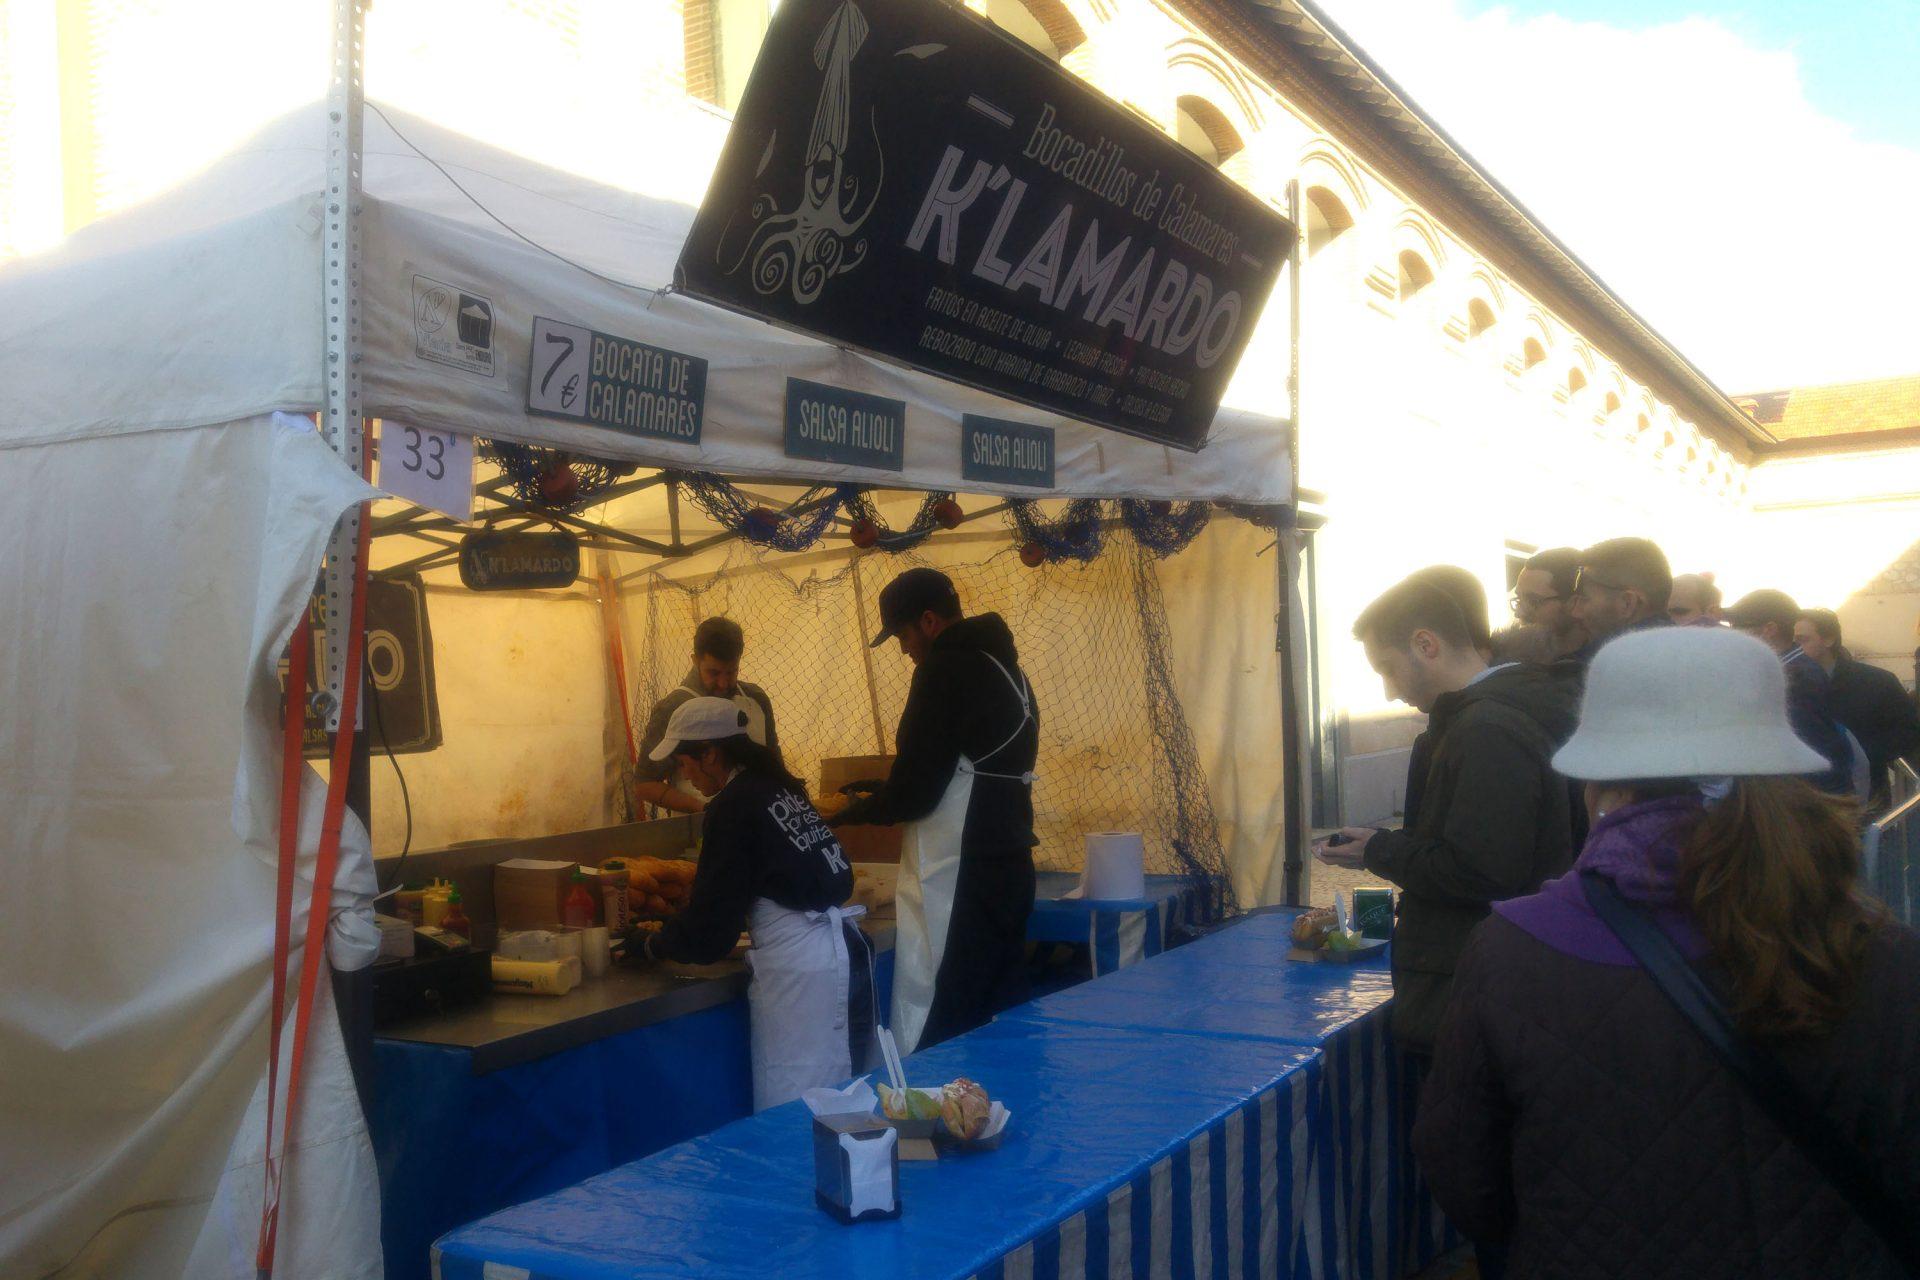 El mercado Madrid Productores del Matadero